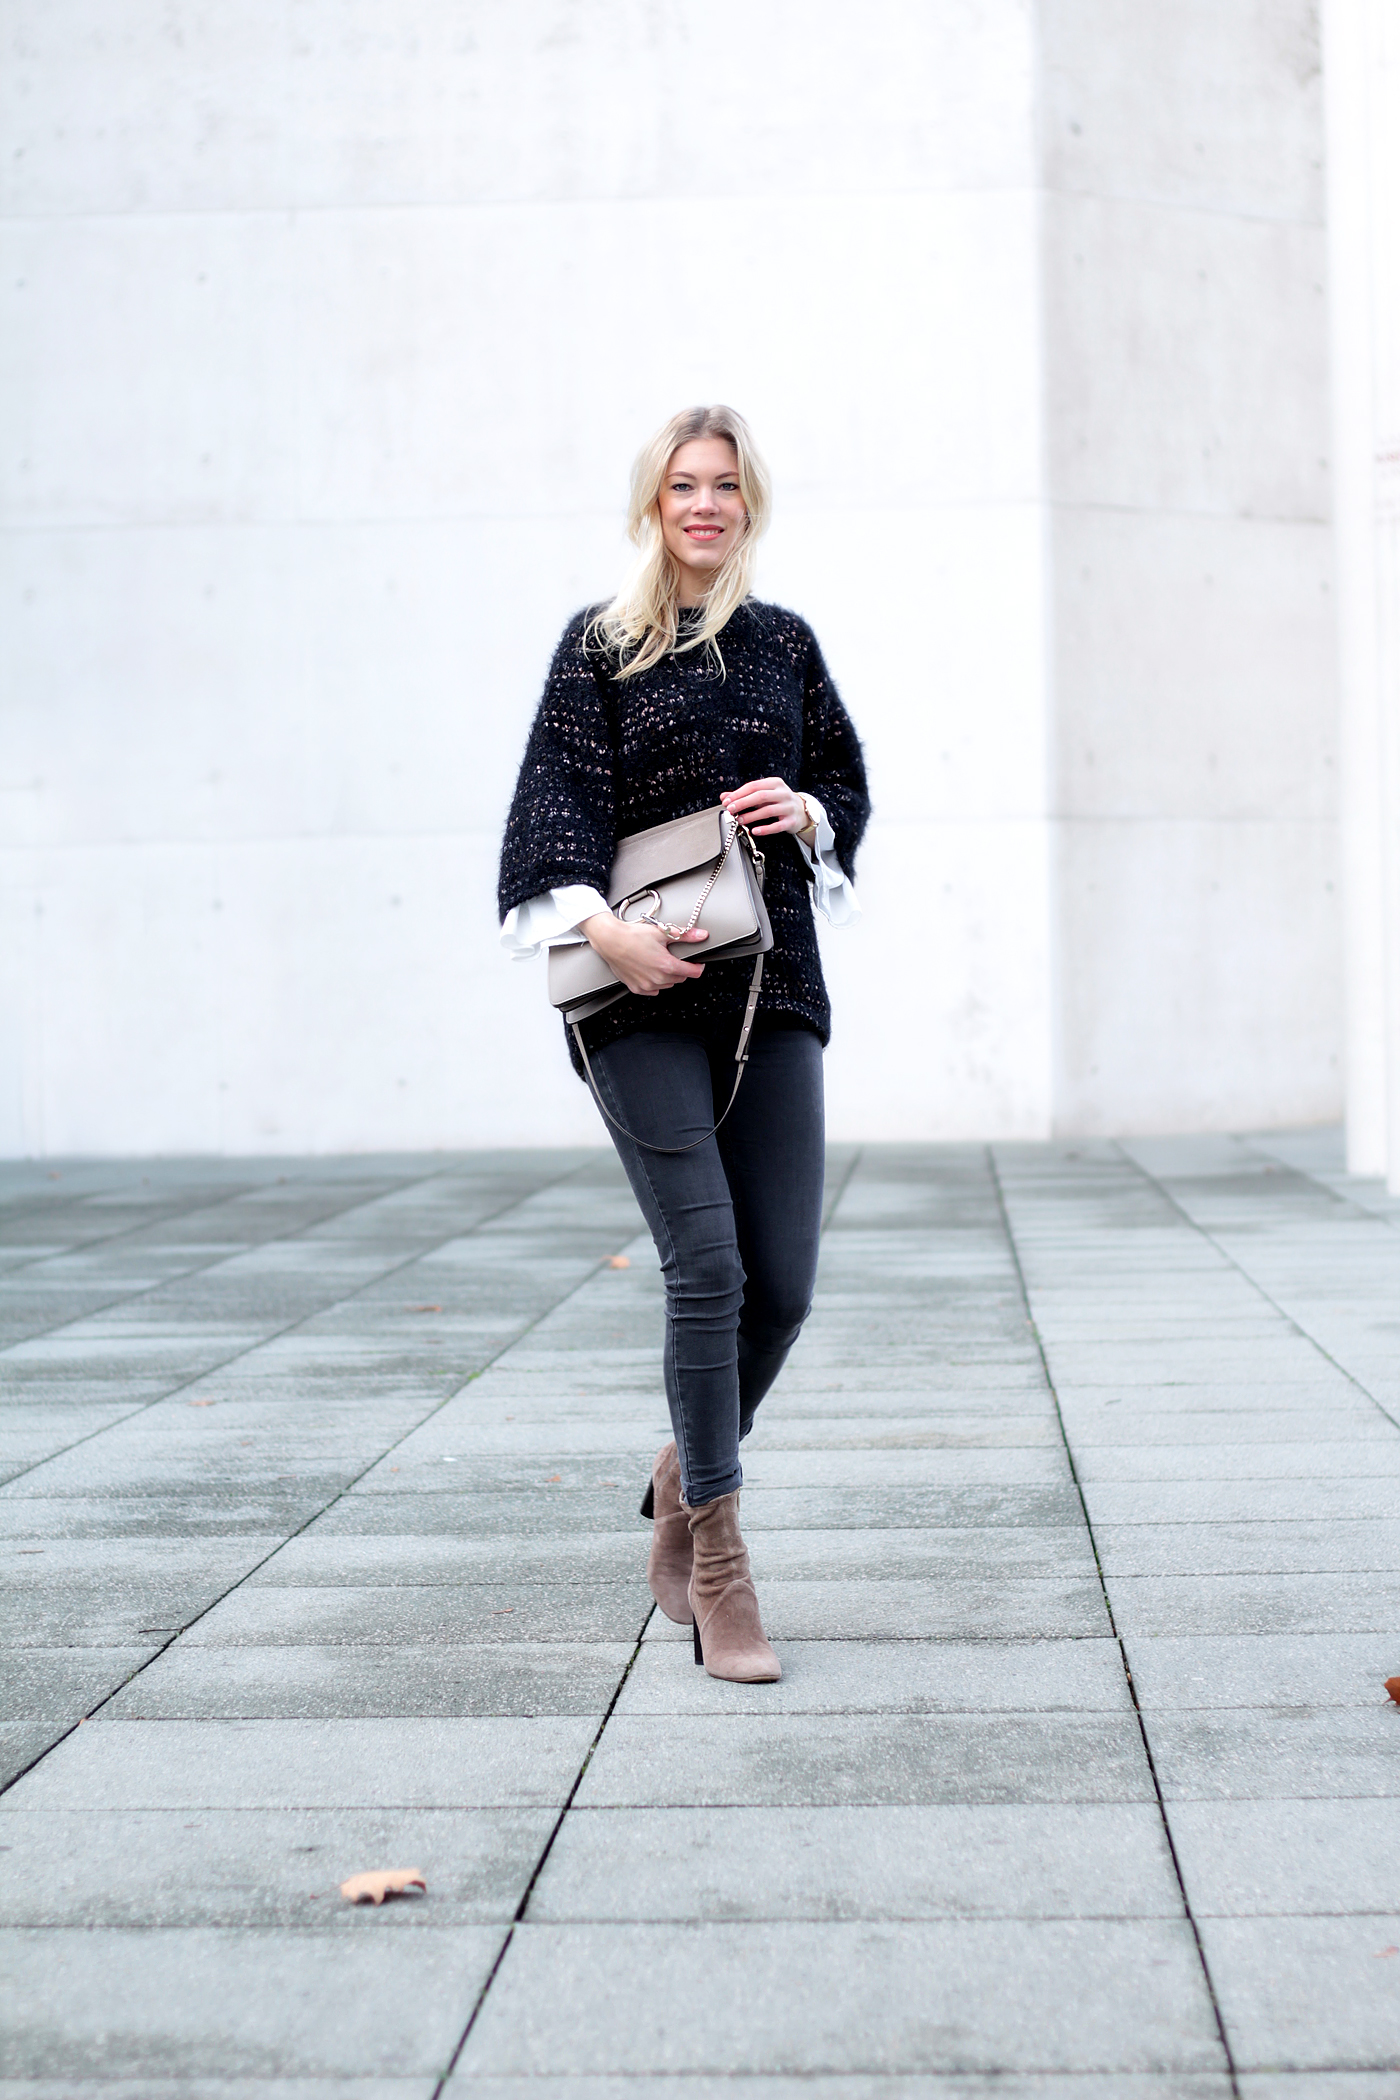 chloe_somehappyshoes_fashionblog-zara_boots-bonn